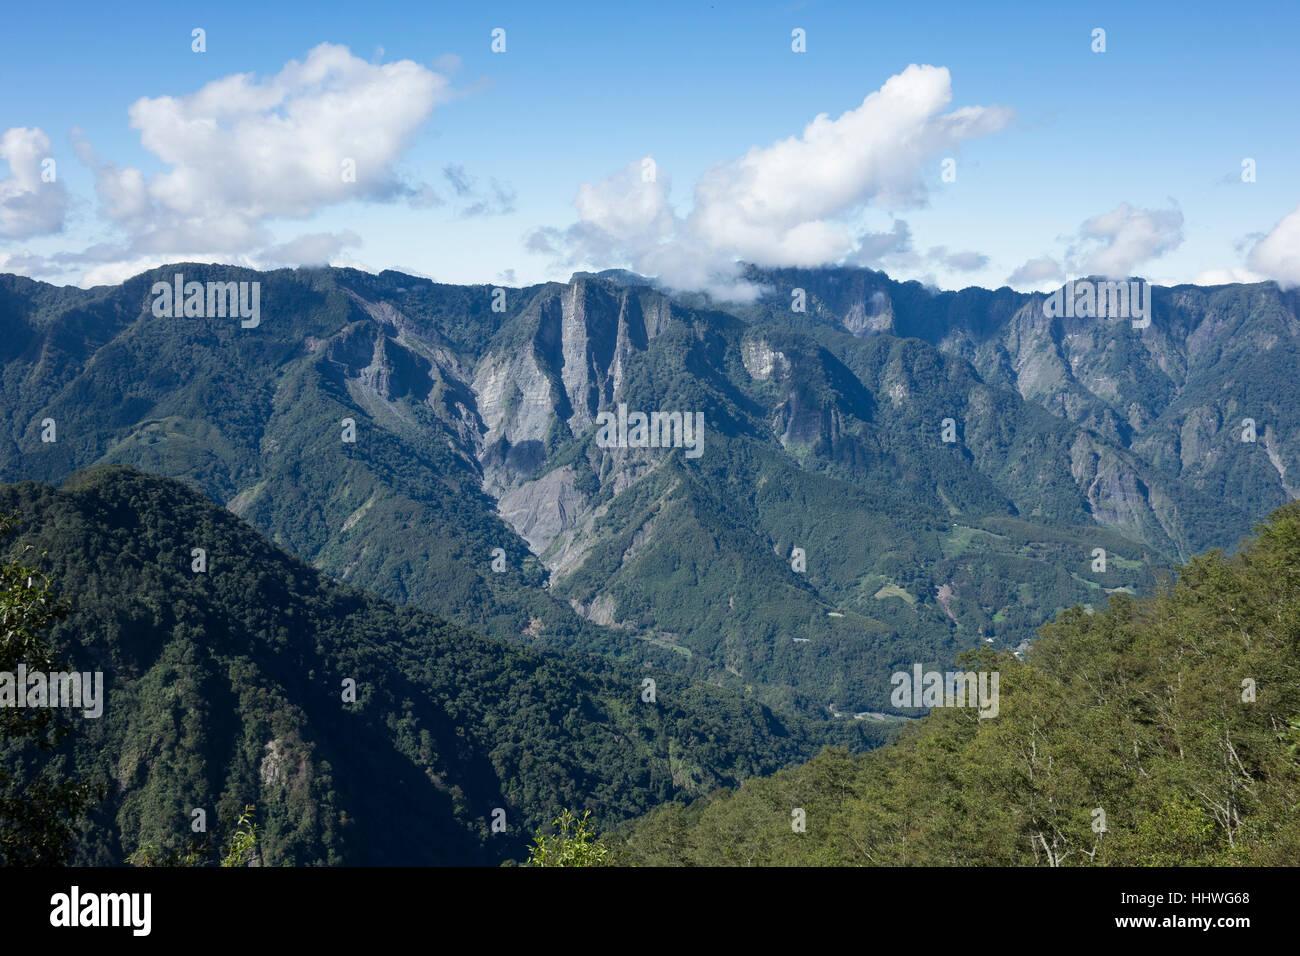 Taiwan, Yushan montagne, Immagini Stock